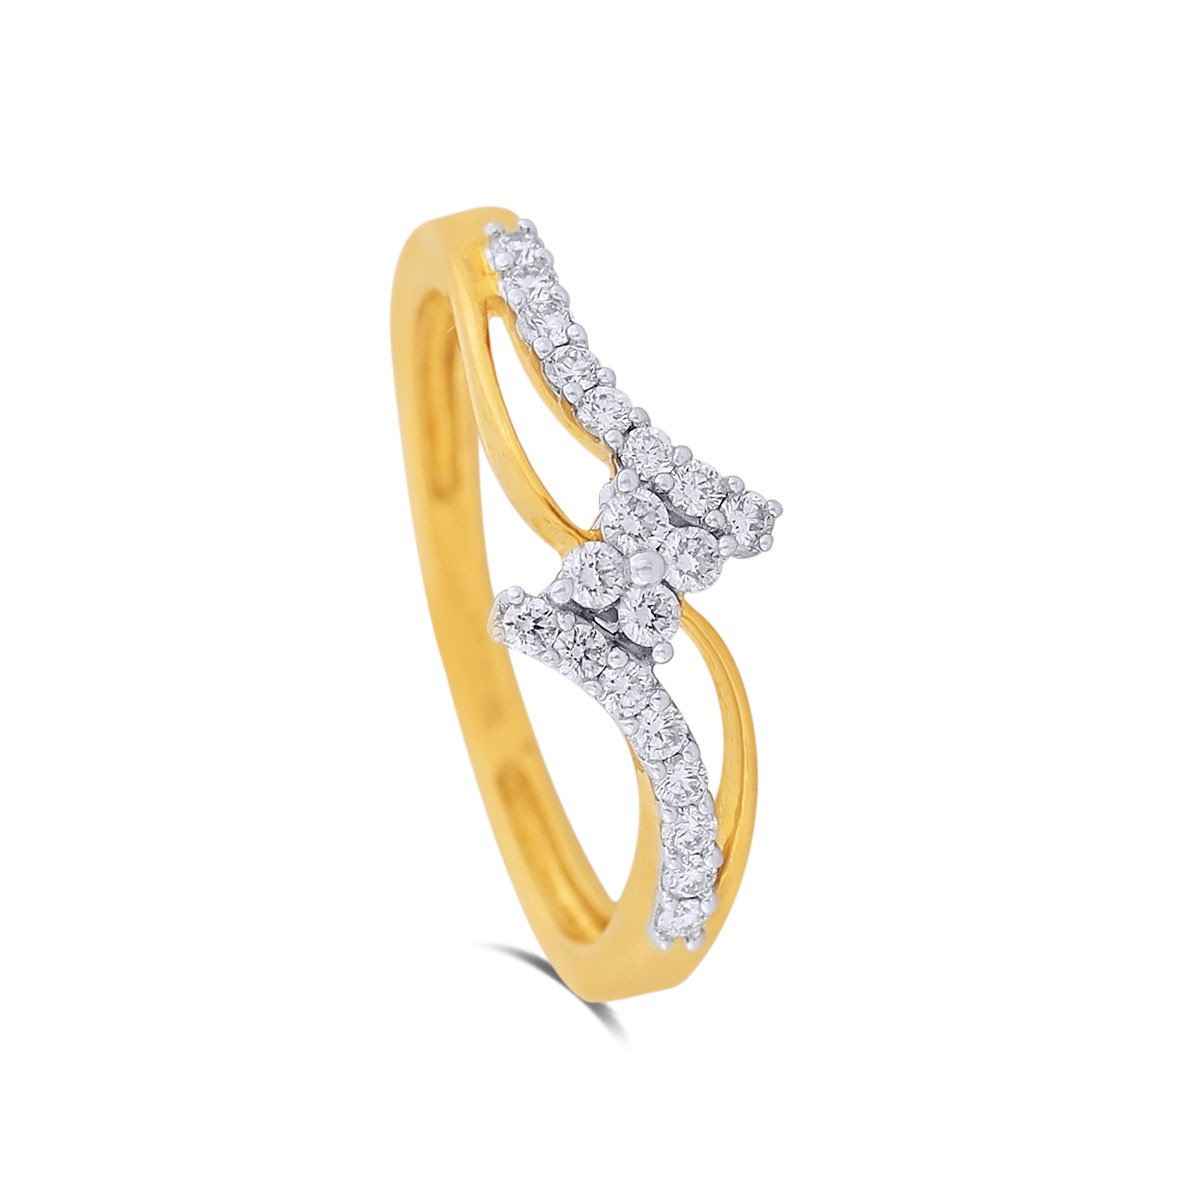 Delila Yellow Gold Diamond Ring